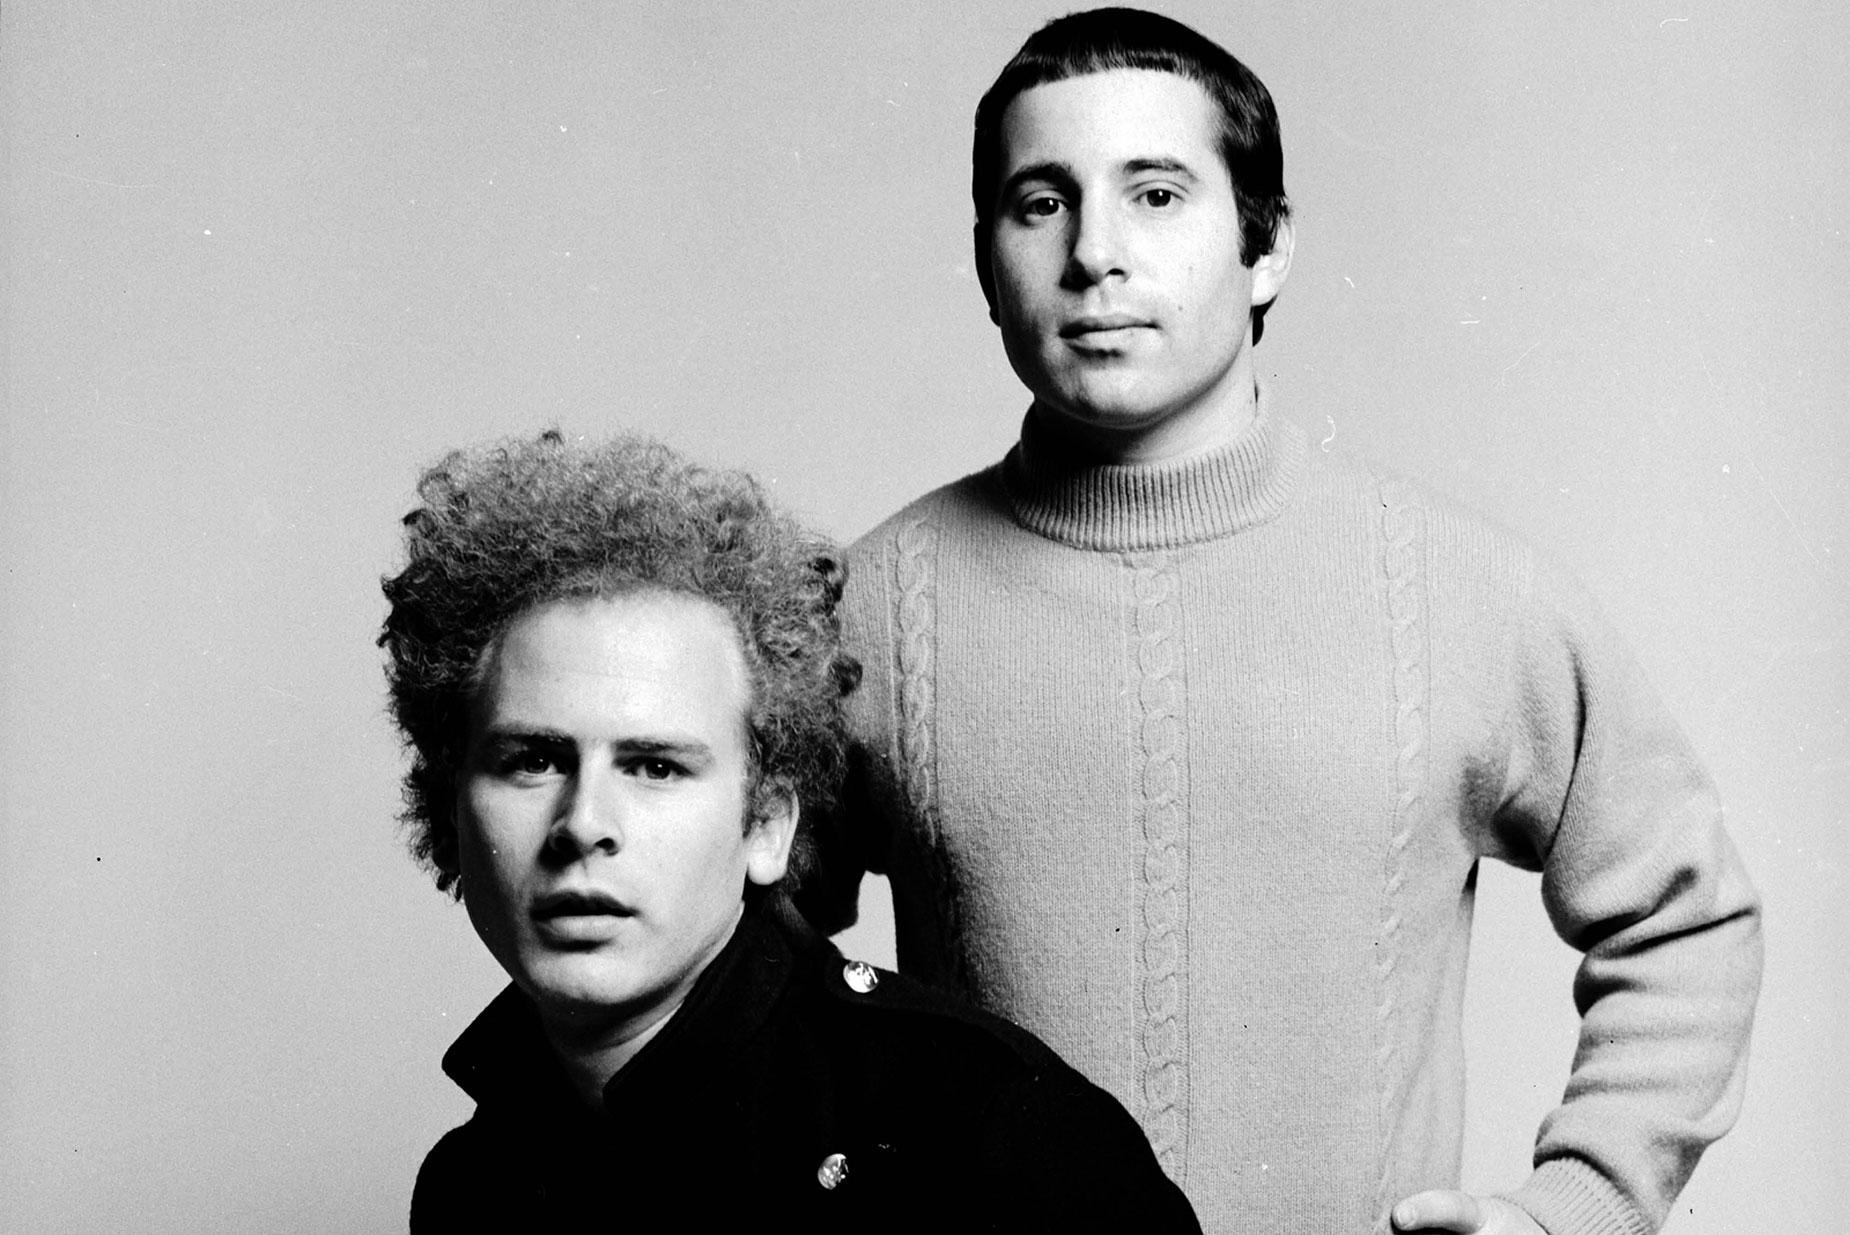 simon garfunkel Simon and Garfunkels Sounds of Silence Turns 50